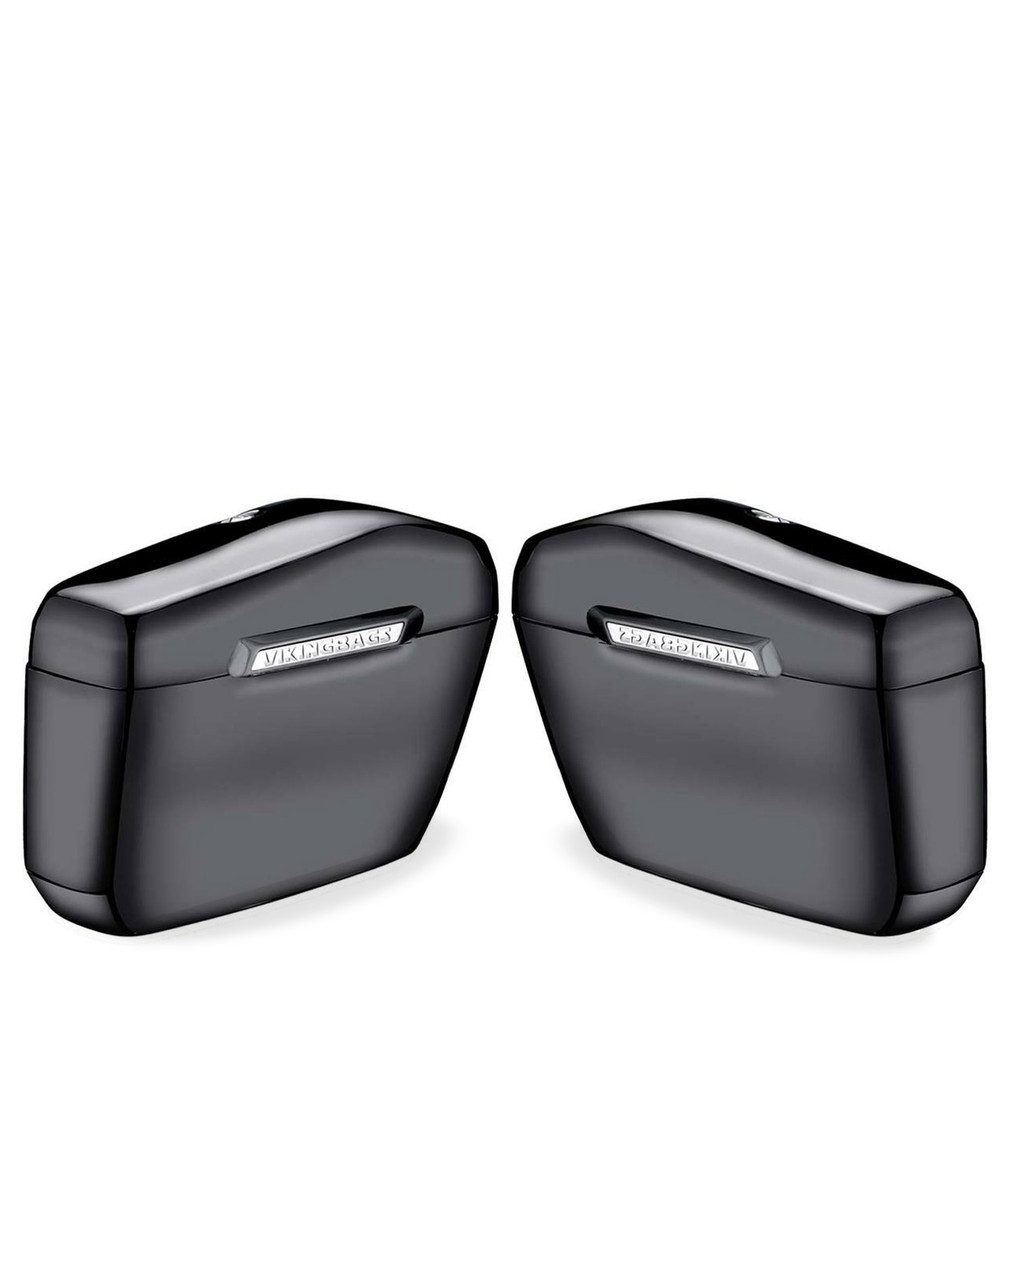 Honda VTX 1800 C Viking Lamellar Large Black Hard Saddlebags both bags view